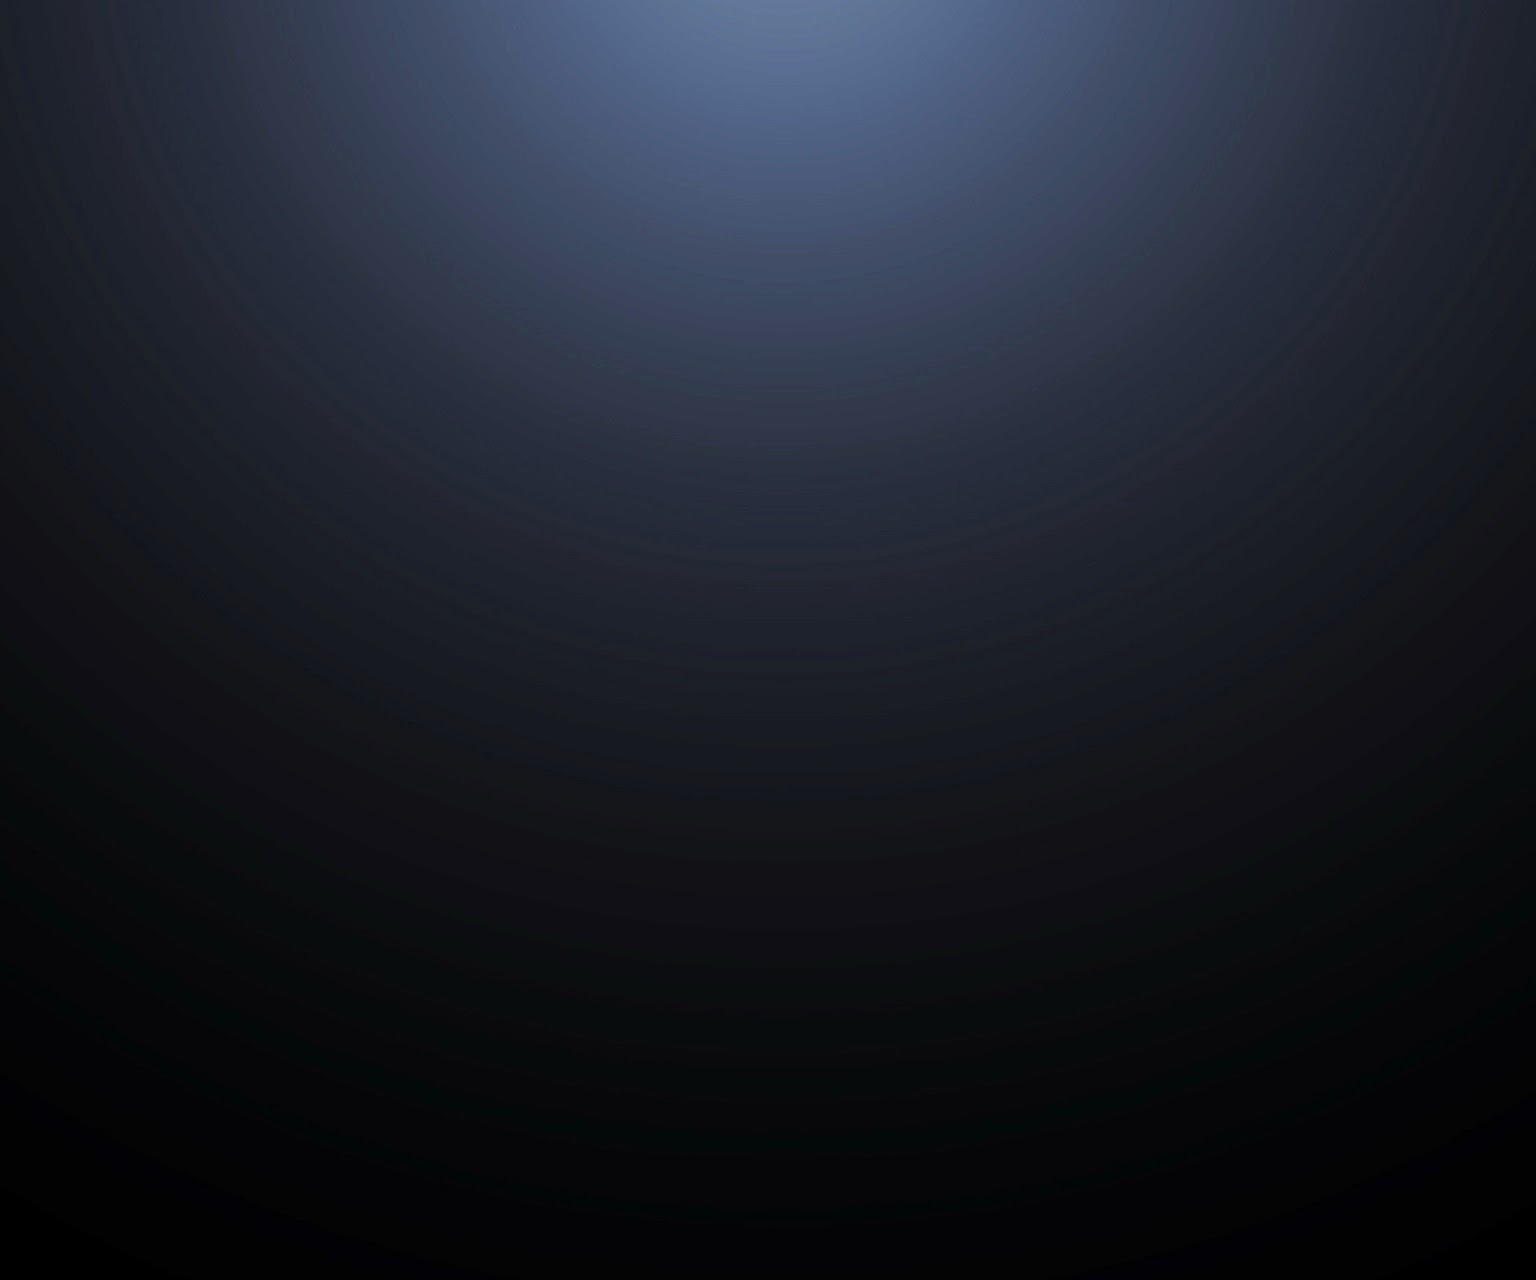 Blackerry Wallpaper: Simple BlackBerry Z10 1536x1280 Backgrounds 2014